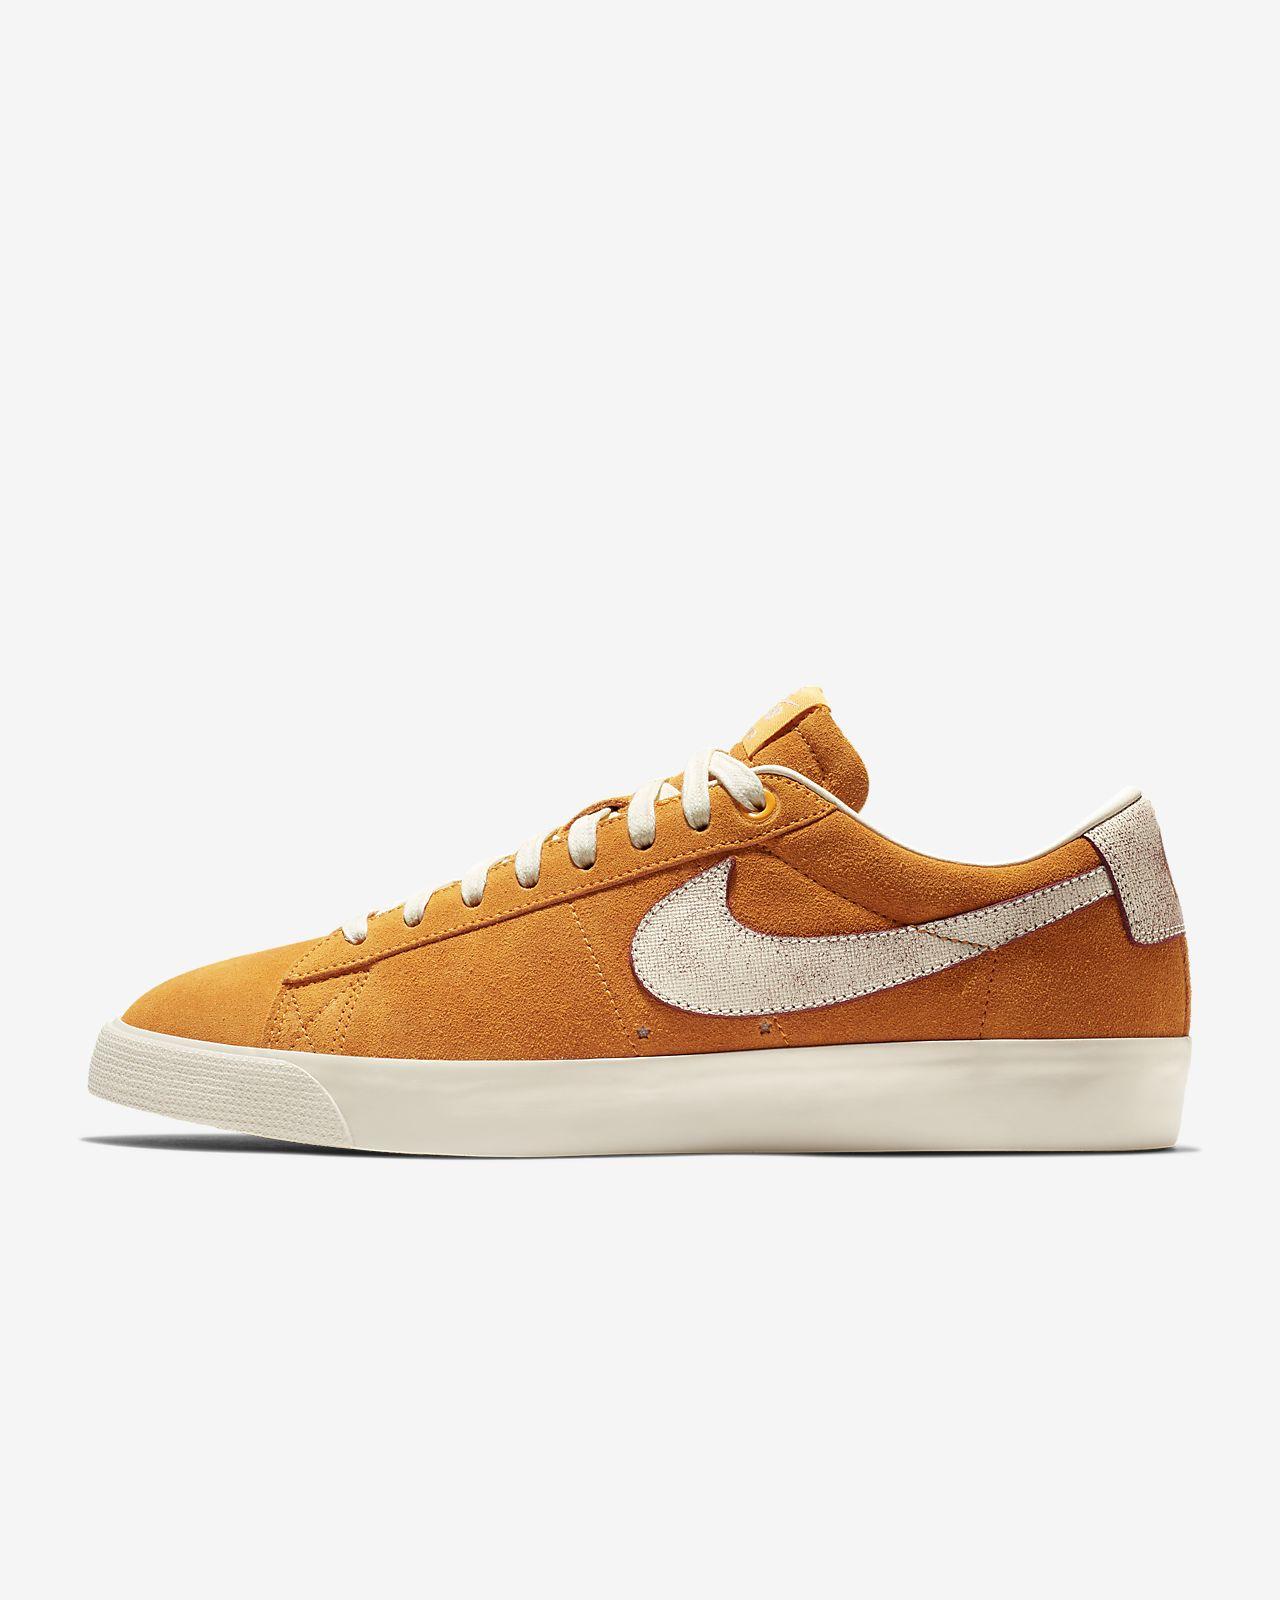 Nike Blazer Low GT QS男子滑板鞋